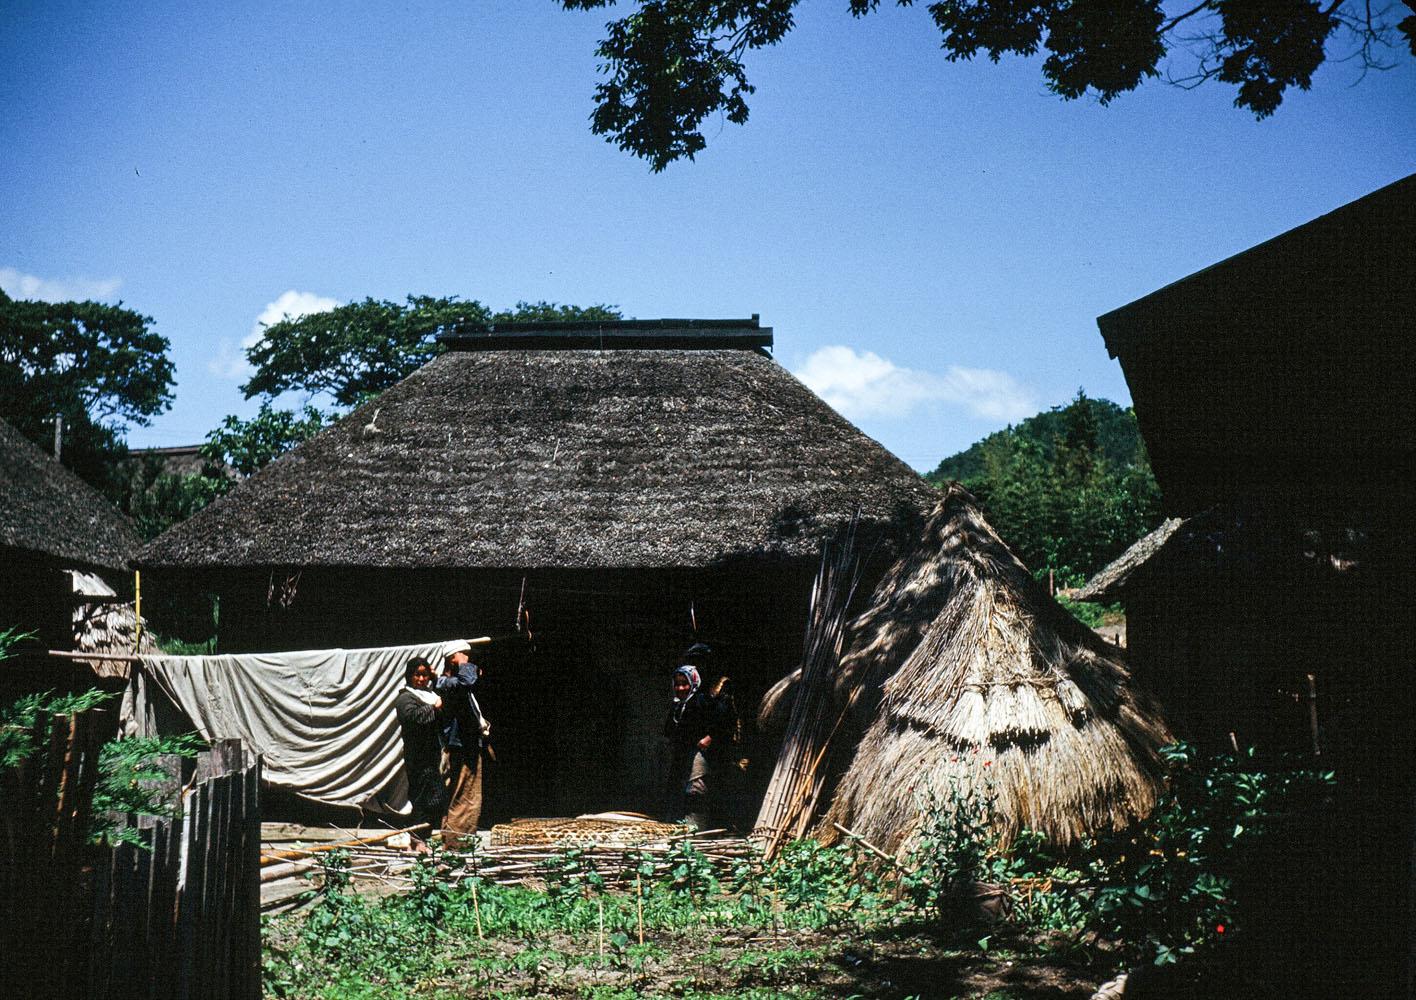 491- Farmhouse